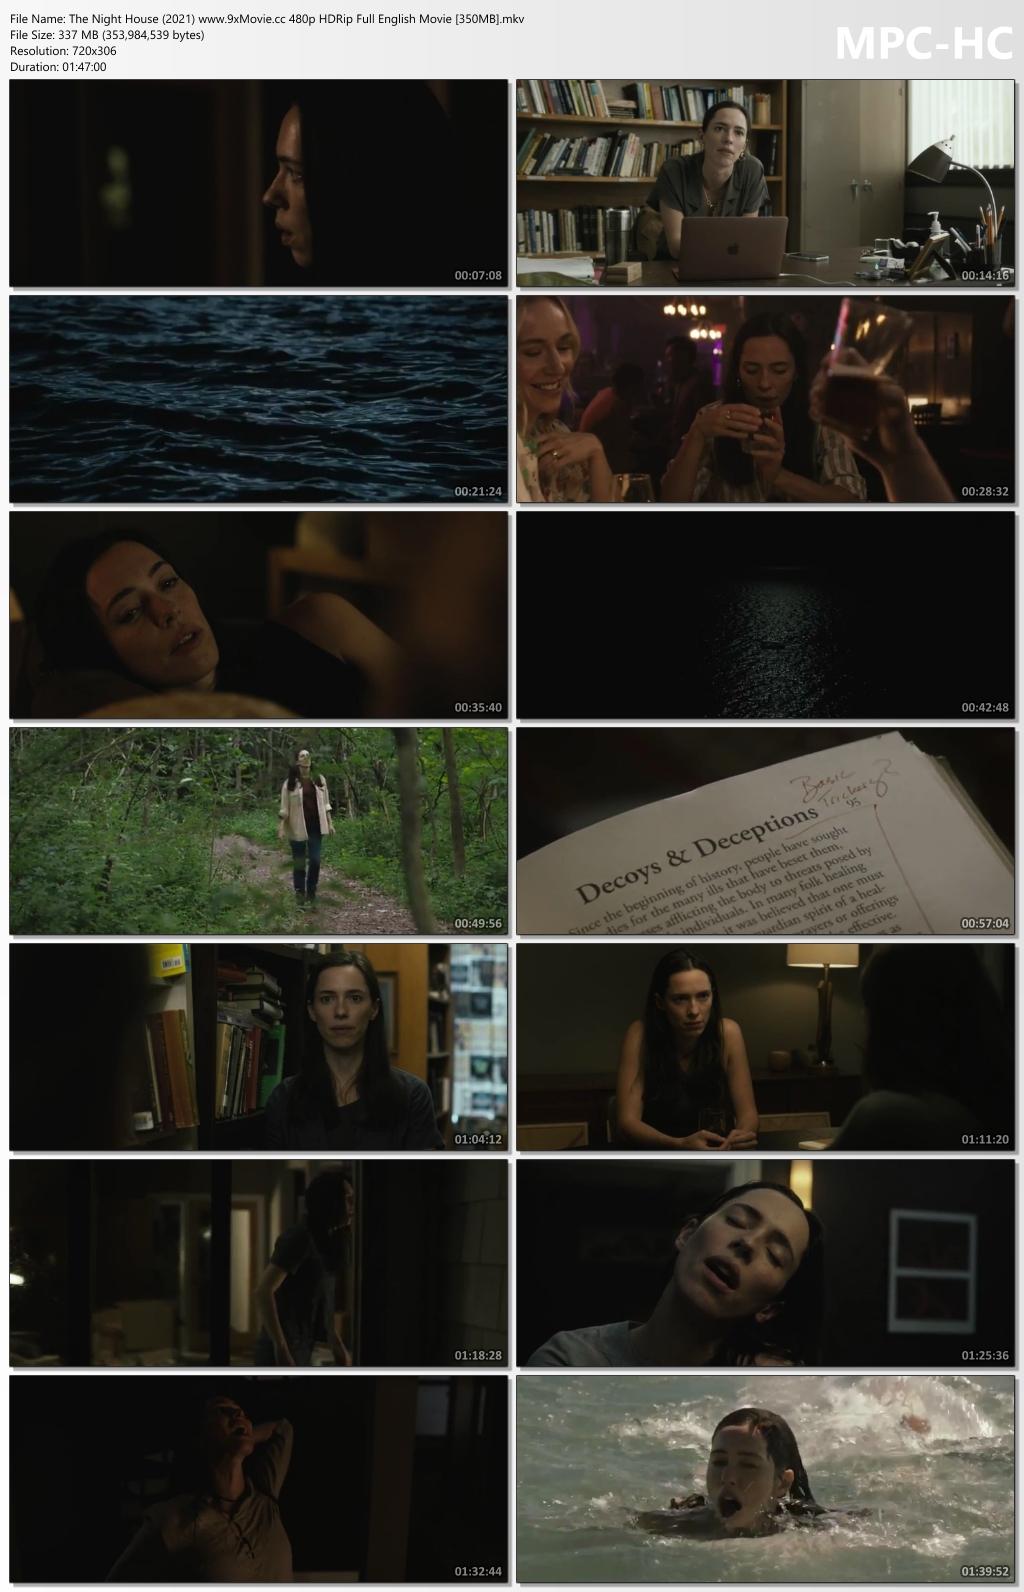 The-Night-House-2021-www-9x-Movie-cc-480p-HDRip-Full-English-Movie-350-MB-mkv